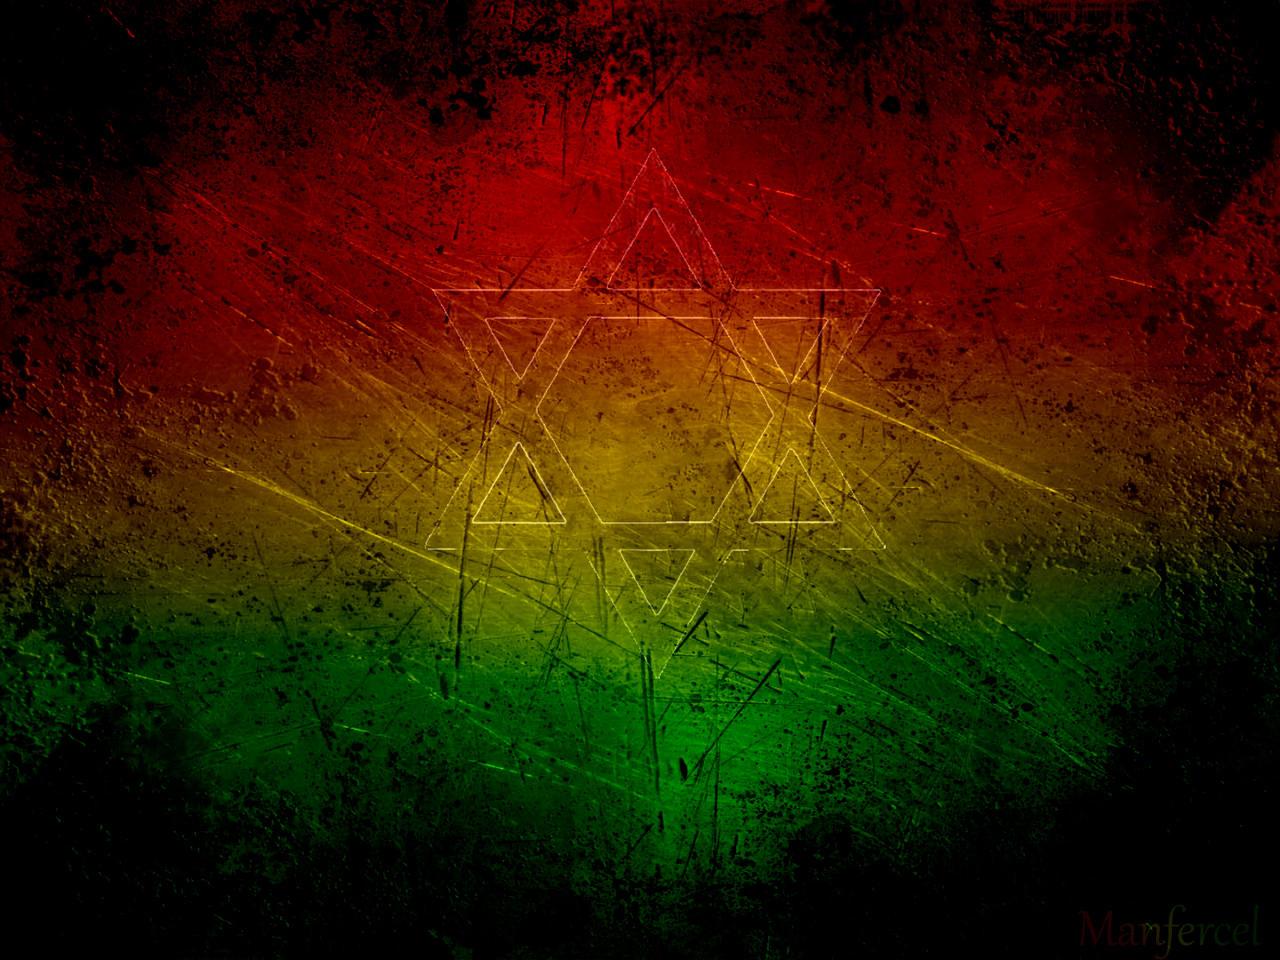 Rastafari Wallpaper By Manfercel On Deviantart HD Wallpapers Download Free Images Wallpaper [1000image.com]